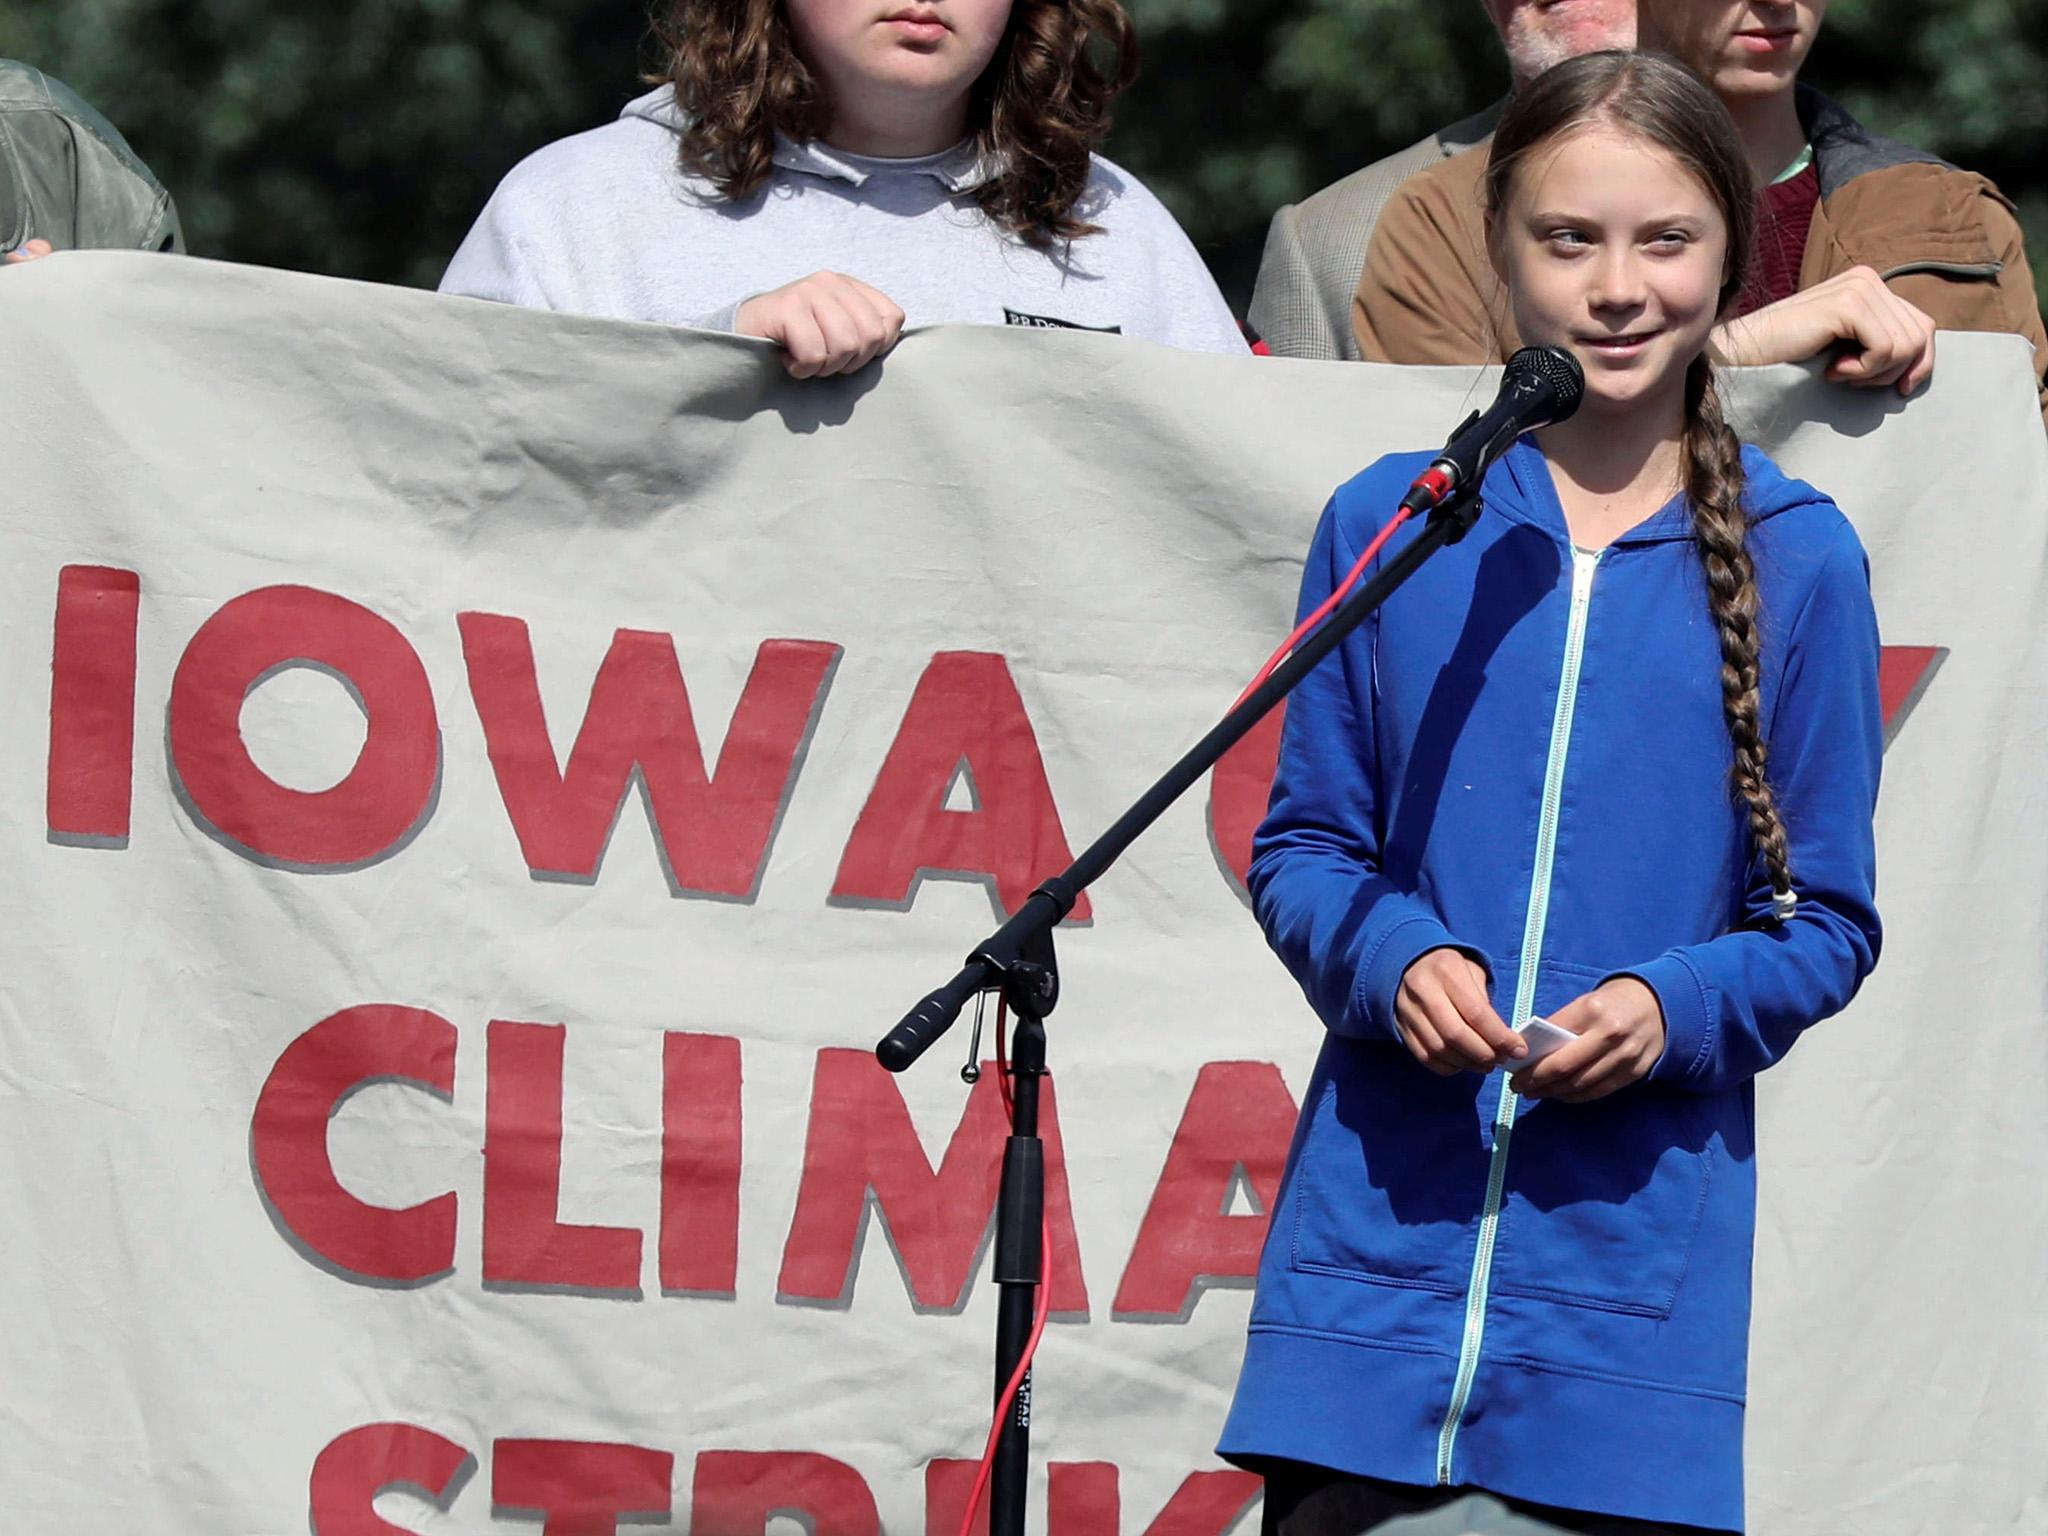 Arnold Schwarzenegger praises climate activist Greta Thunberg: 'I think politicians are listening'